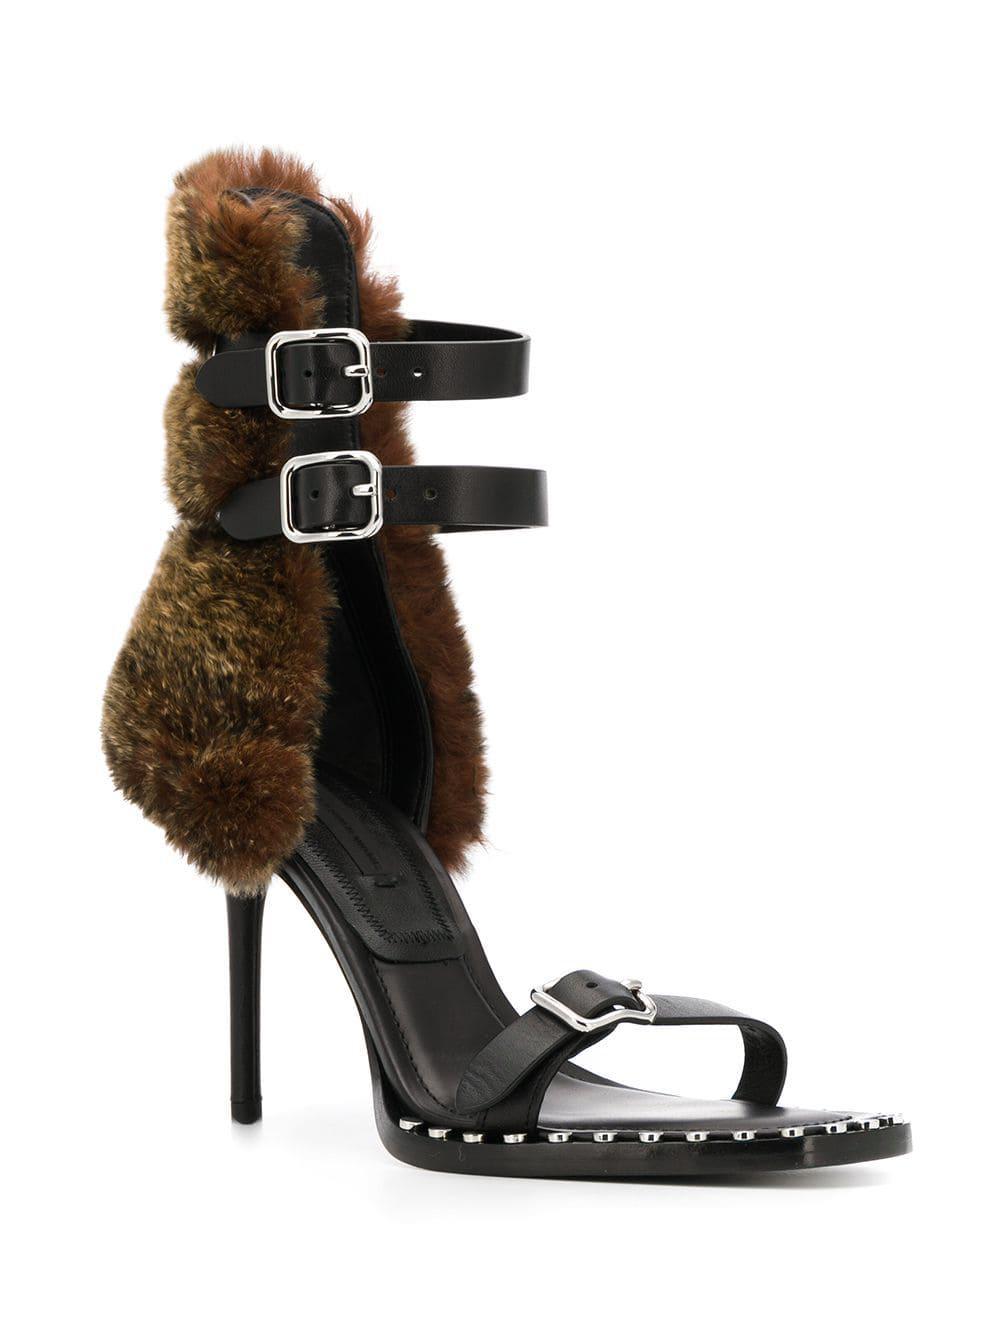 330b652037e Lyst - Alexander Wang Brea High-heel Sandals in Black - Save 47%